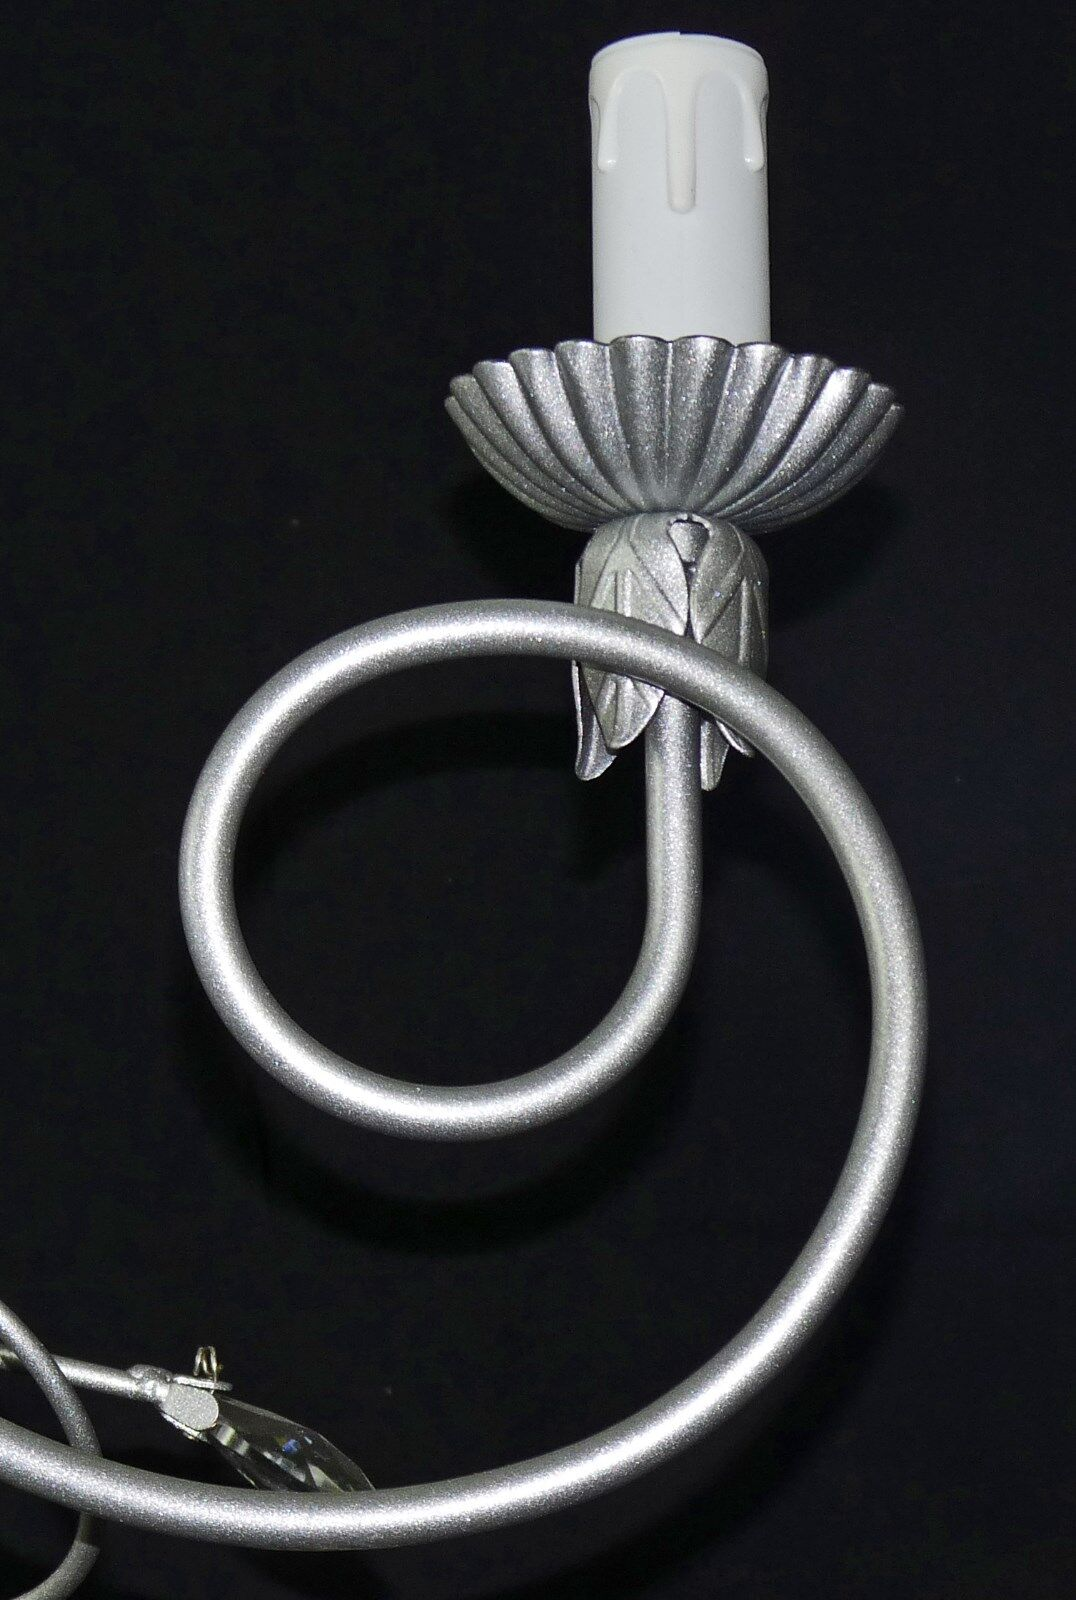 Lampadario ferro battuto 3 luci argento cristallo moderno contemporaneo contemporaneo contemporaneo art.246   Bradées  be6ed1